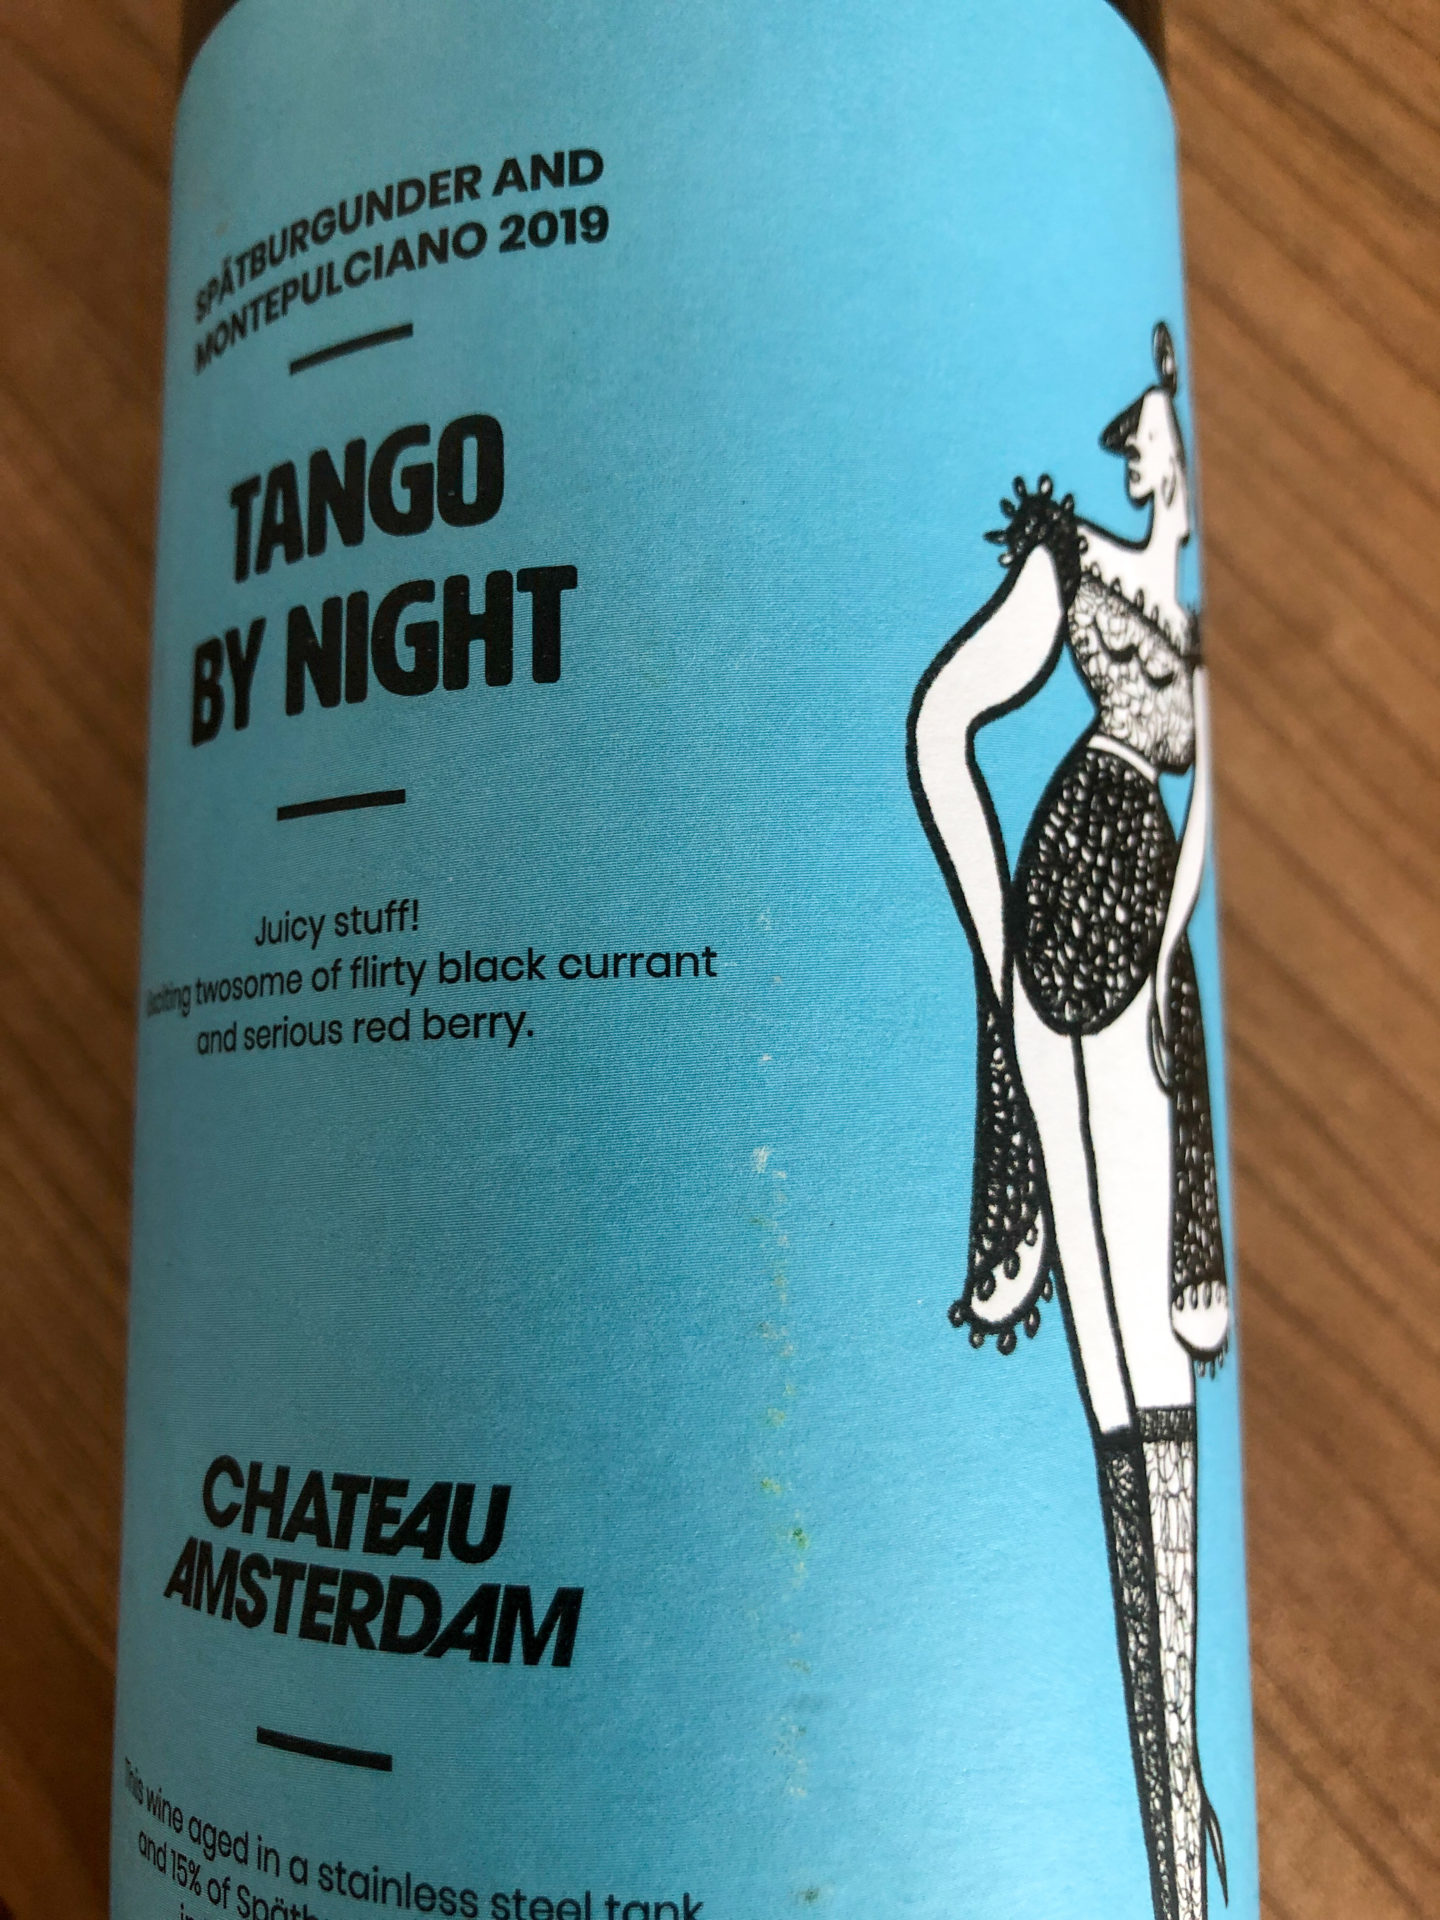 Cuvee Tango by Night von Chateau Amsterdam